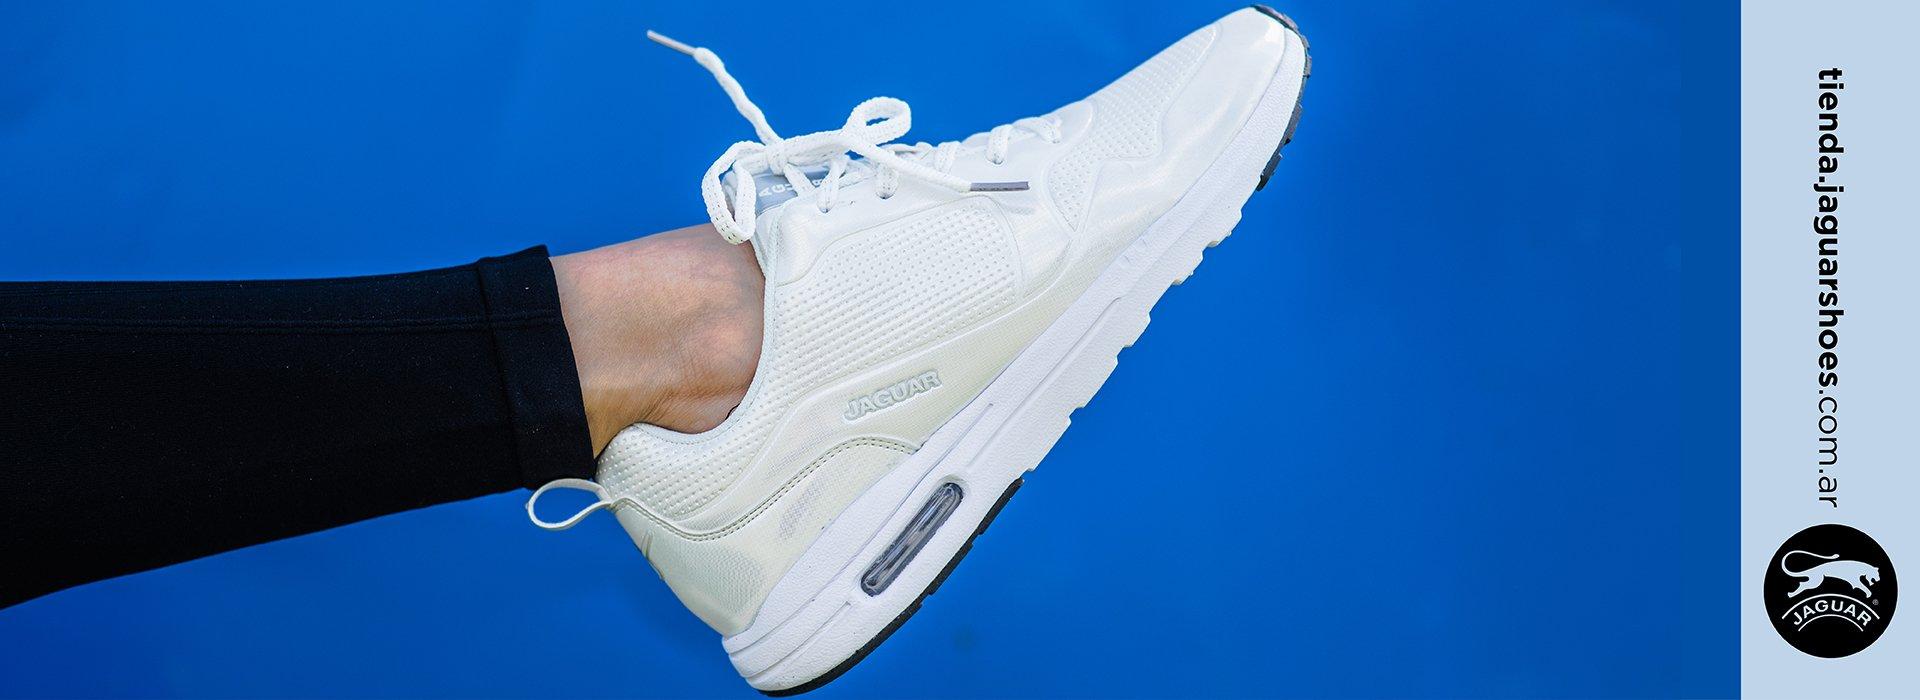 c8d3de97 Tienda Online de JaguarShoes